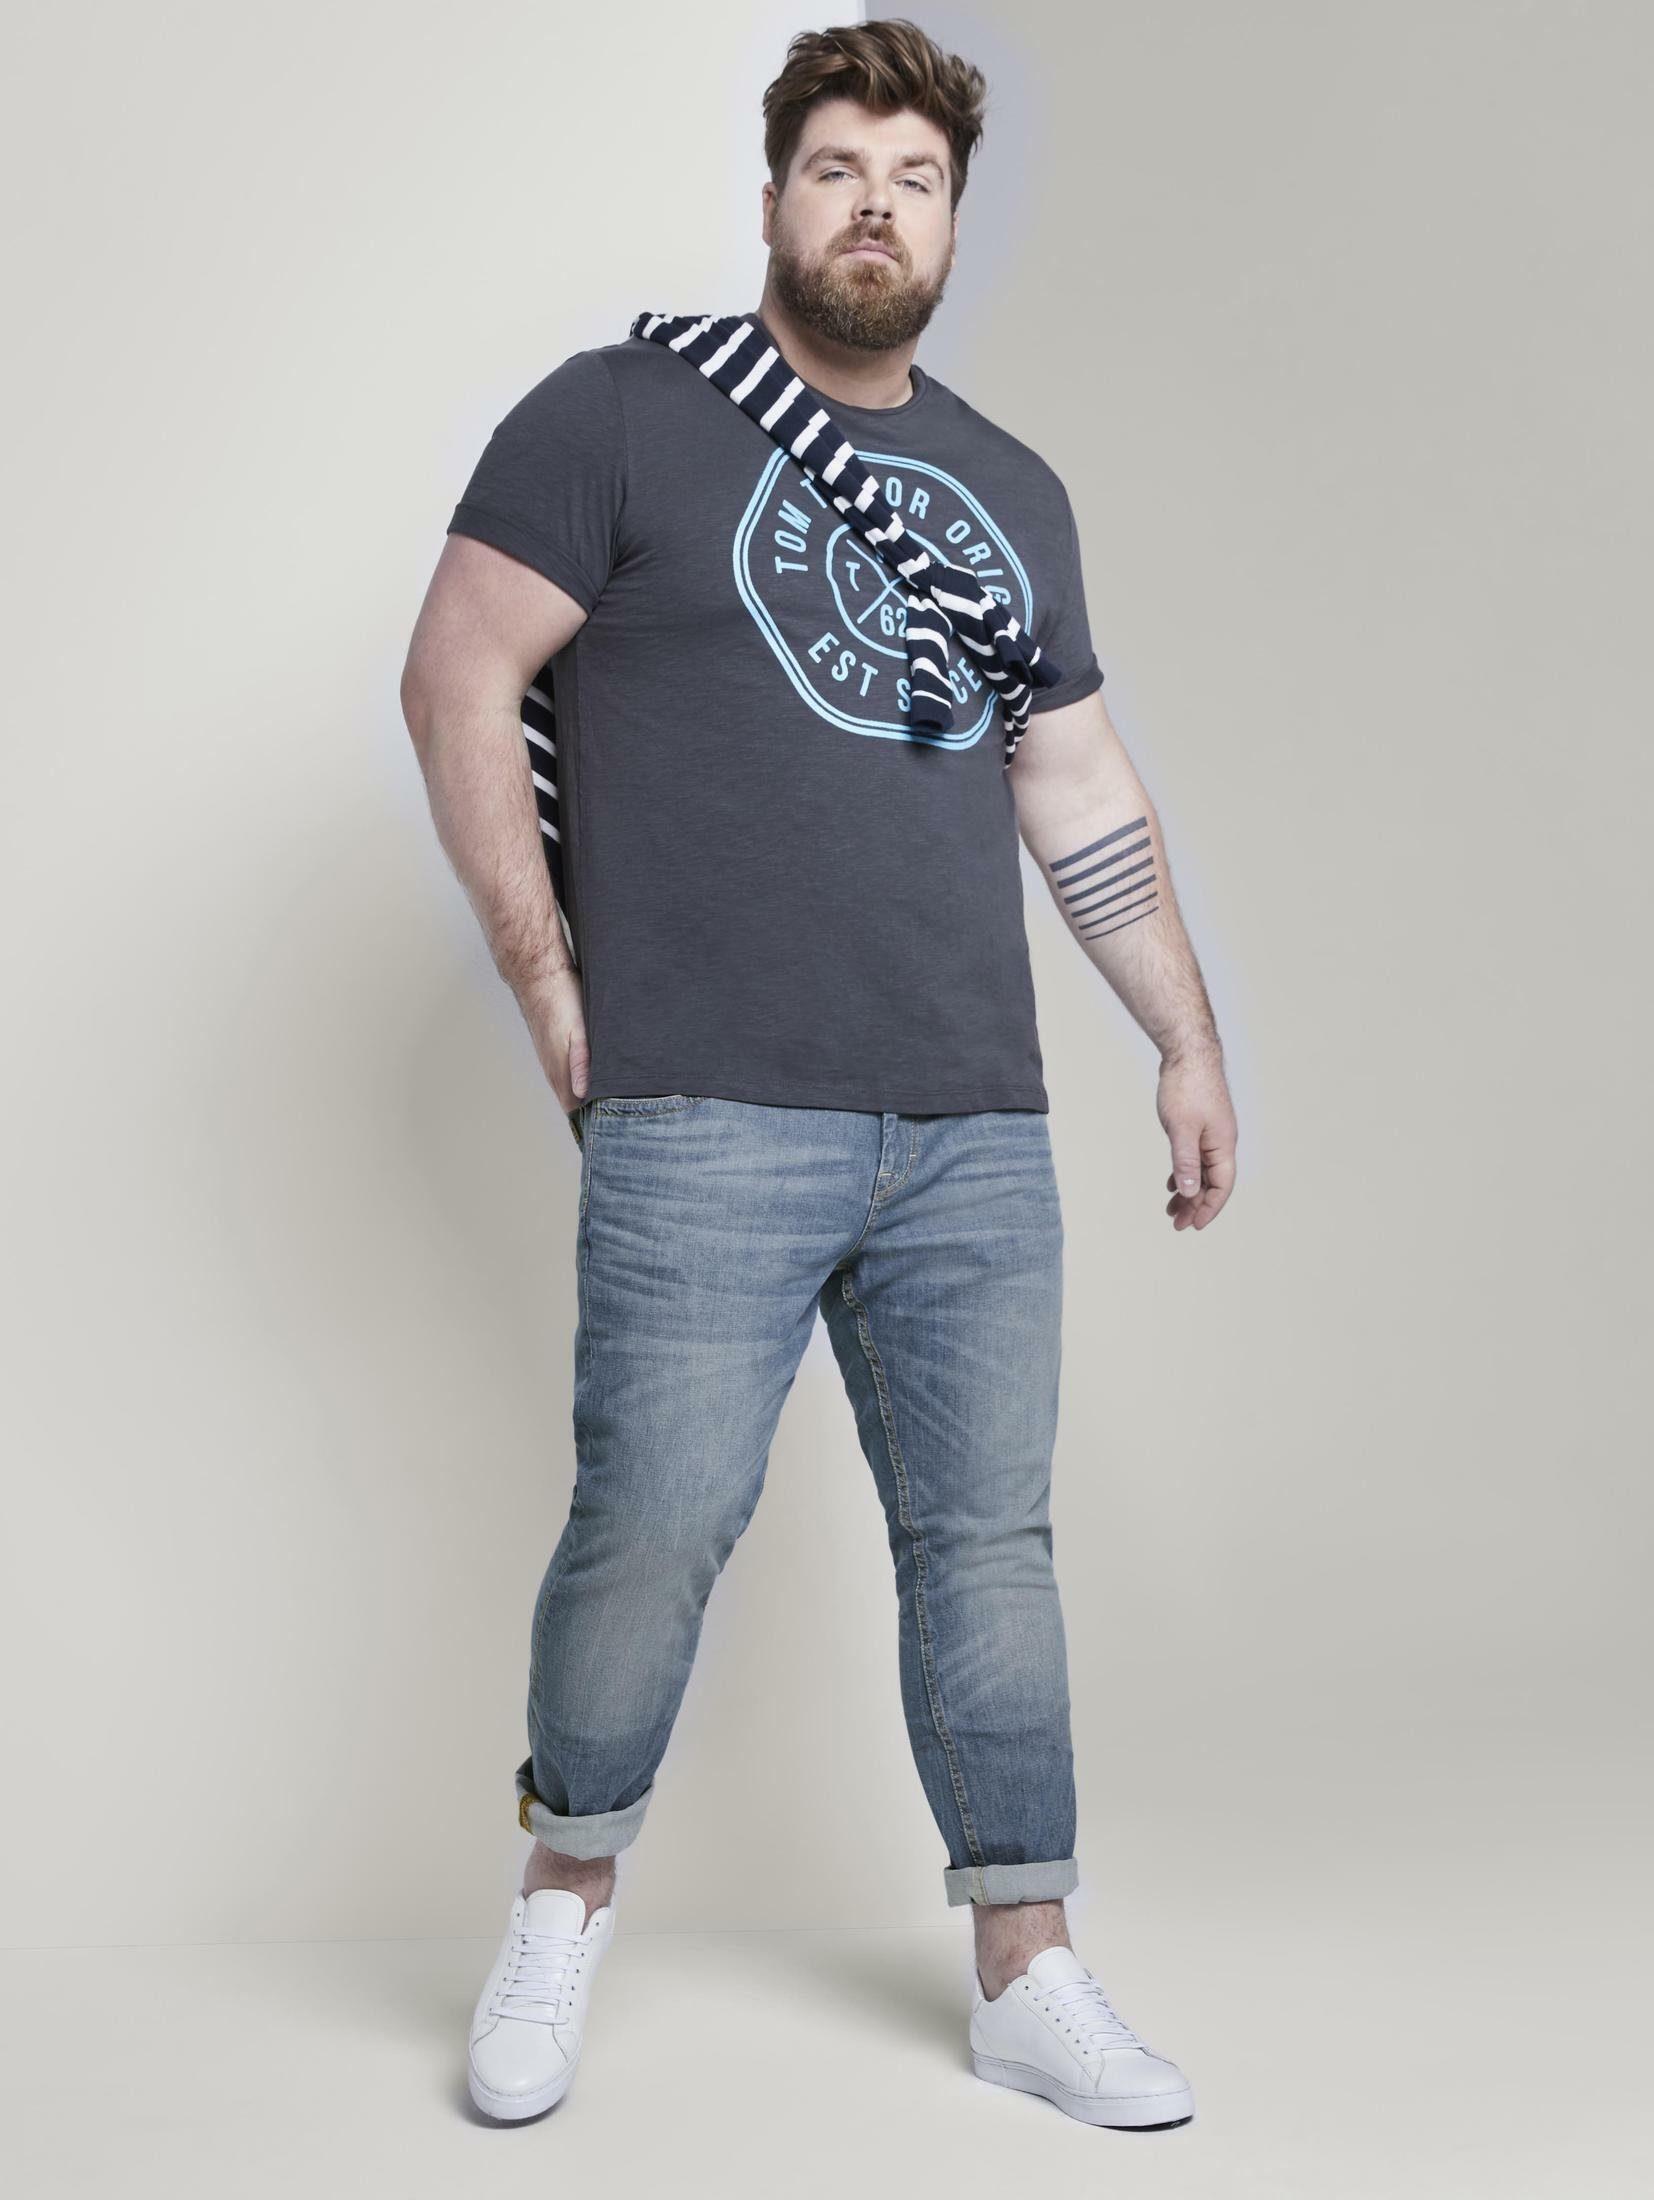 Tom Tailor 5-pocket Jeans Slim Snel Gevonden - Geweldige Prijs